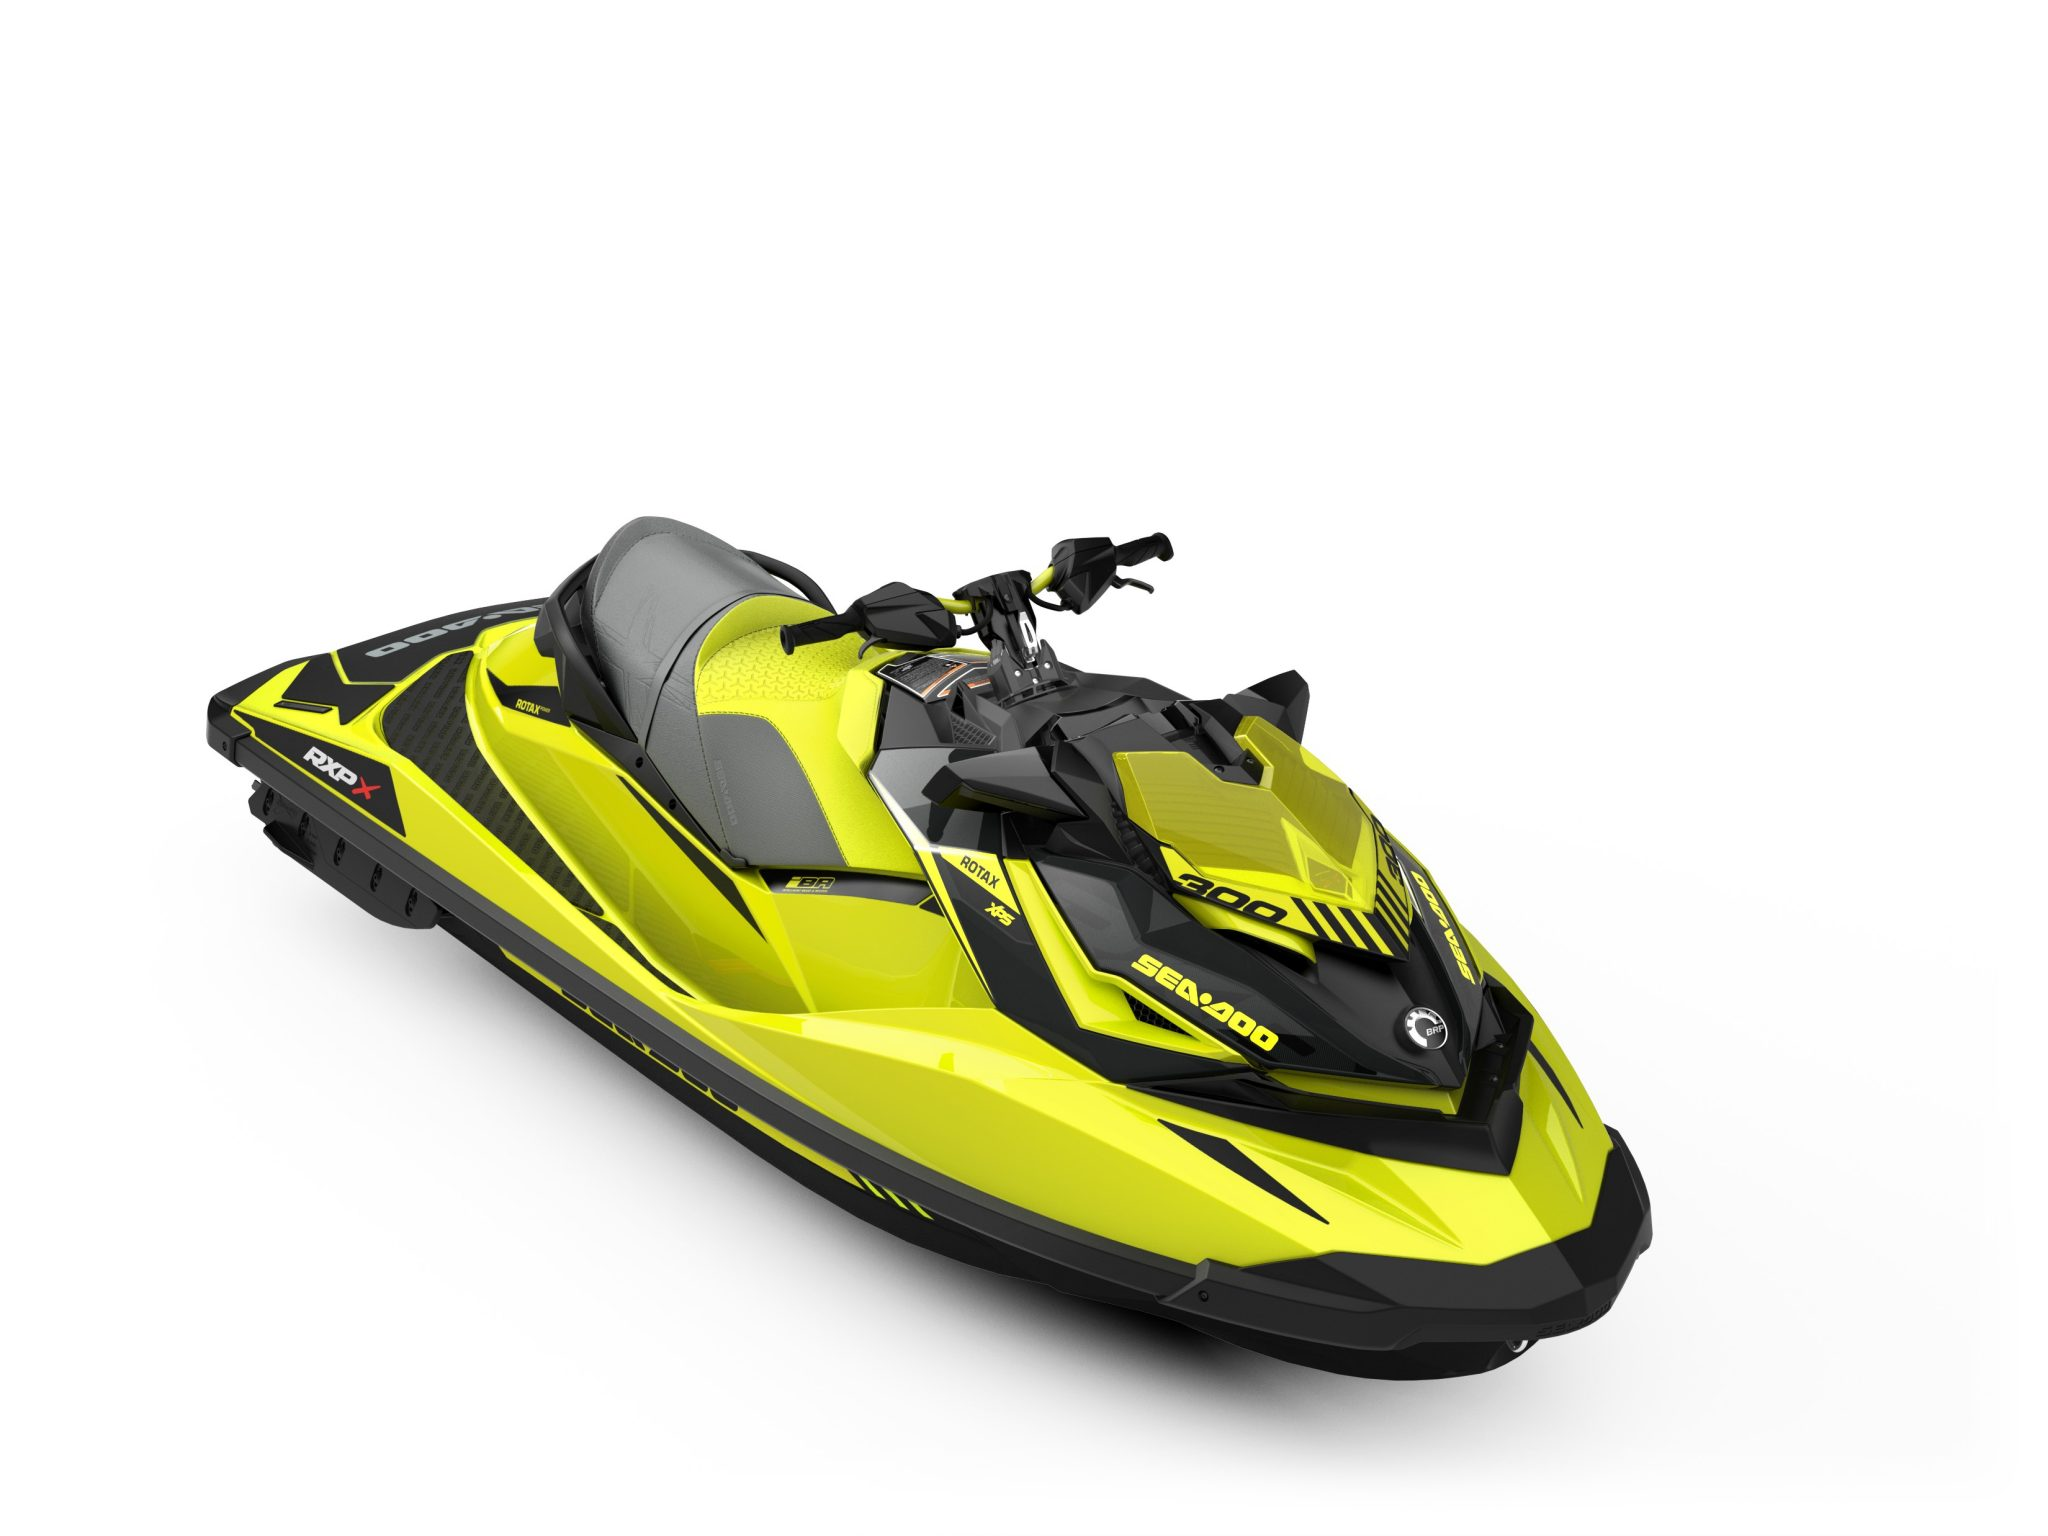 RXT - X 300 RS צהוב שחור